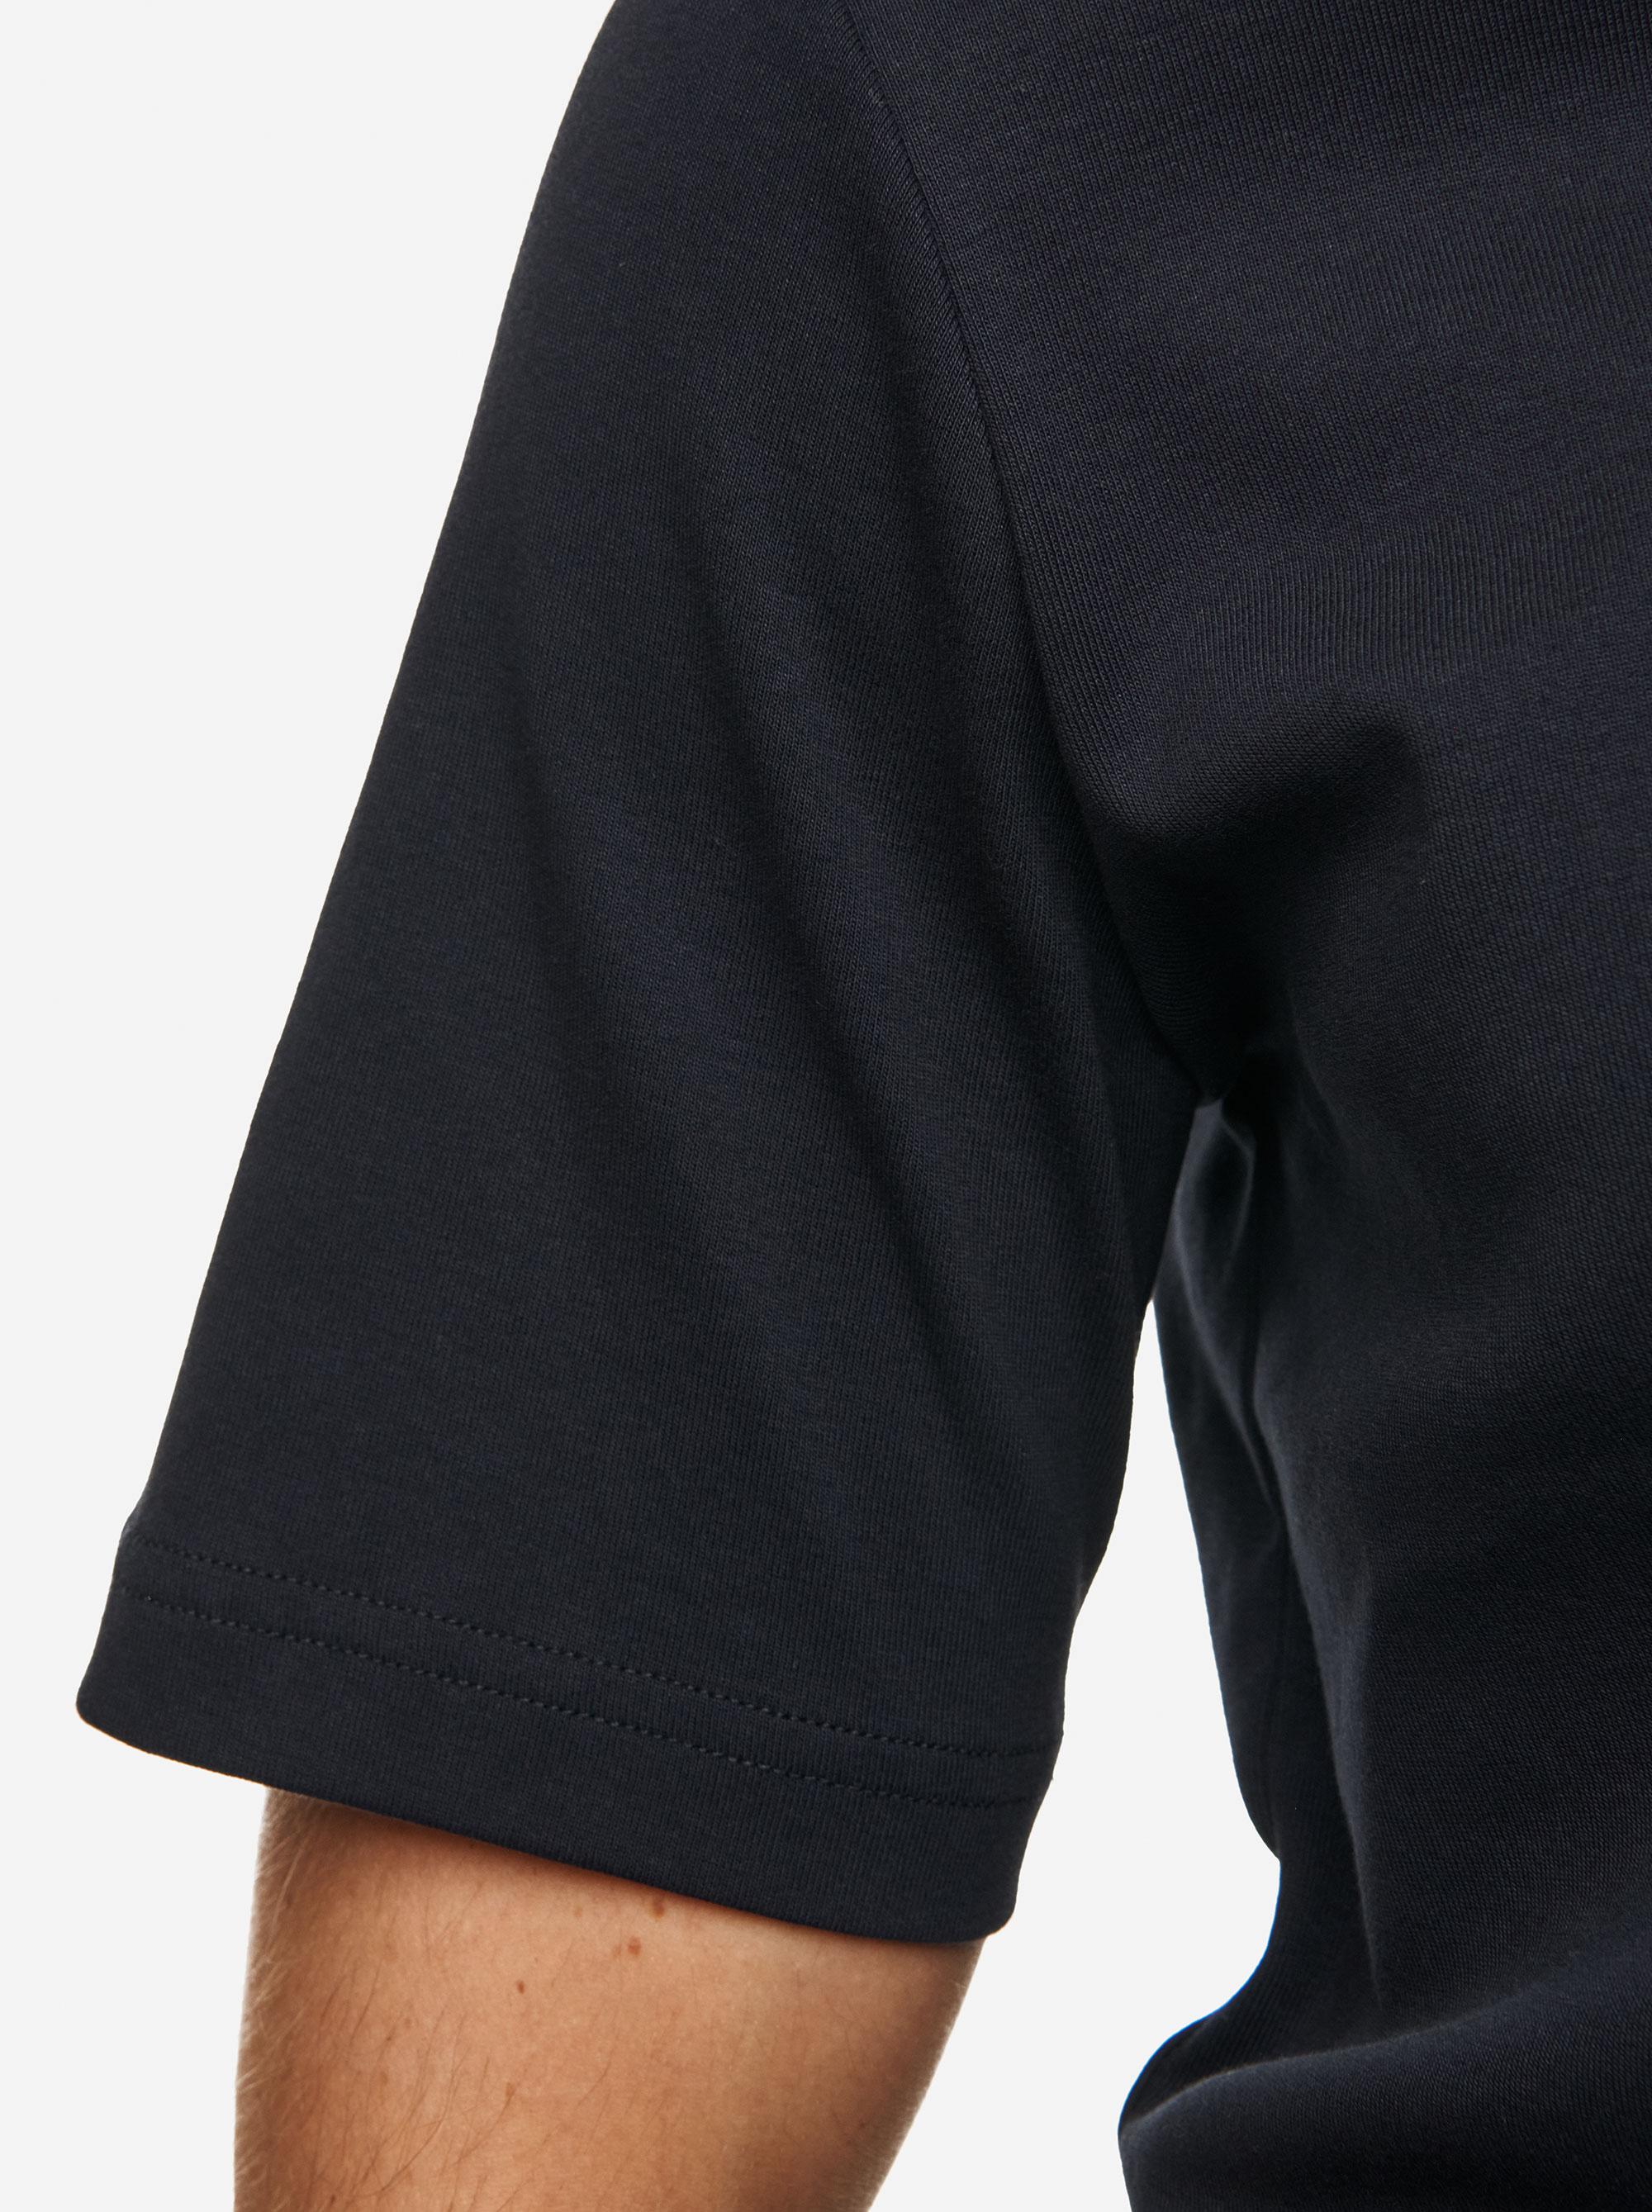 Teym - The T-Shirt - Men - Blue - 3